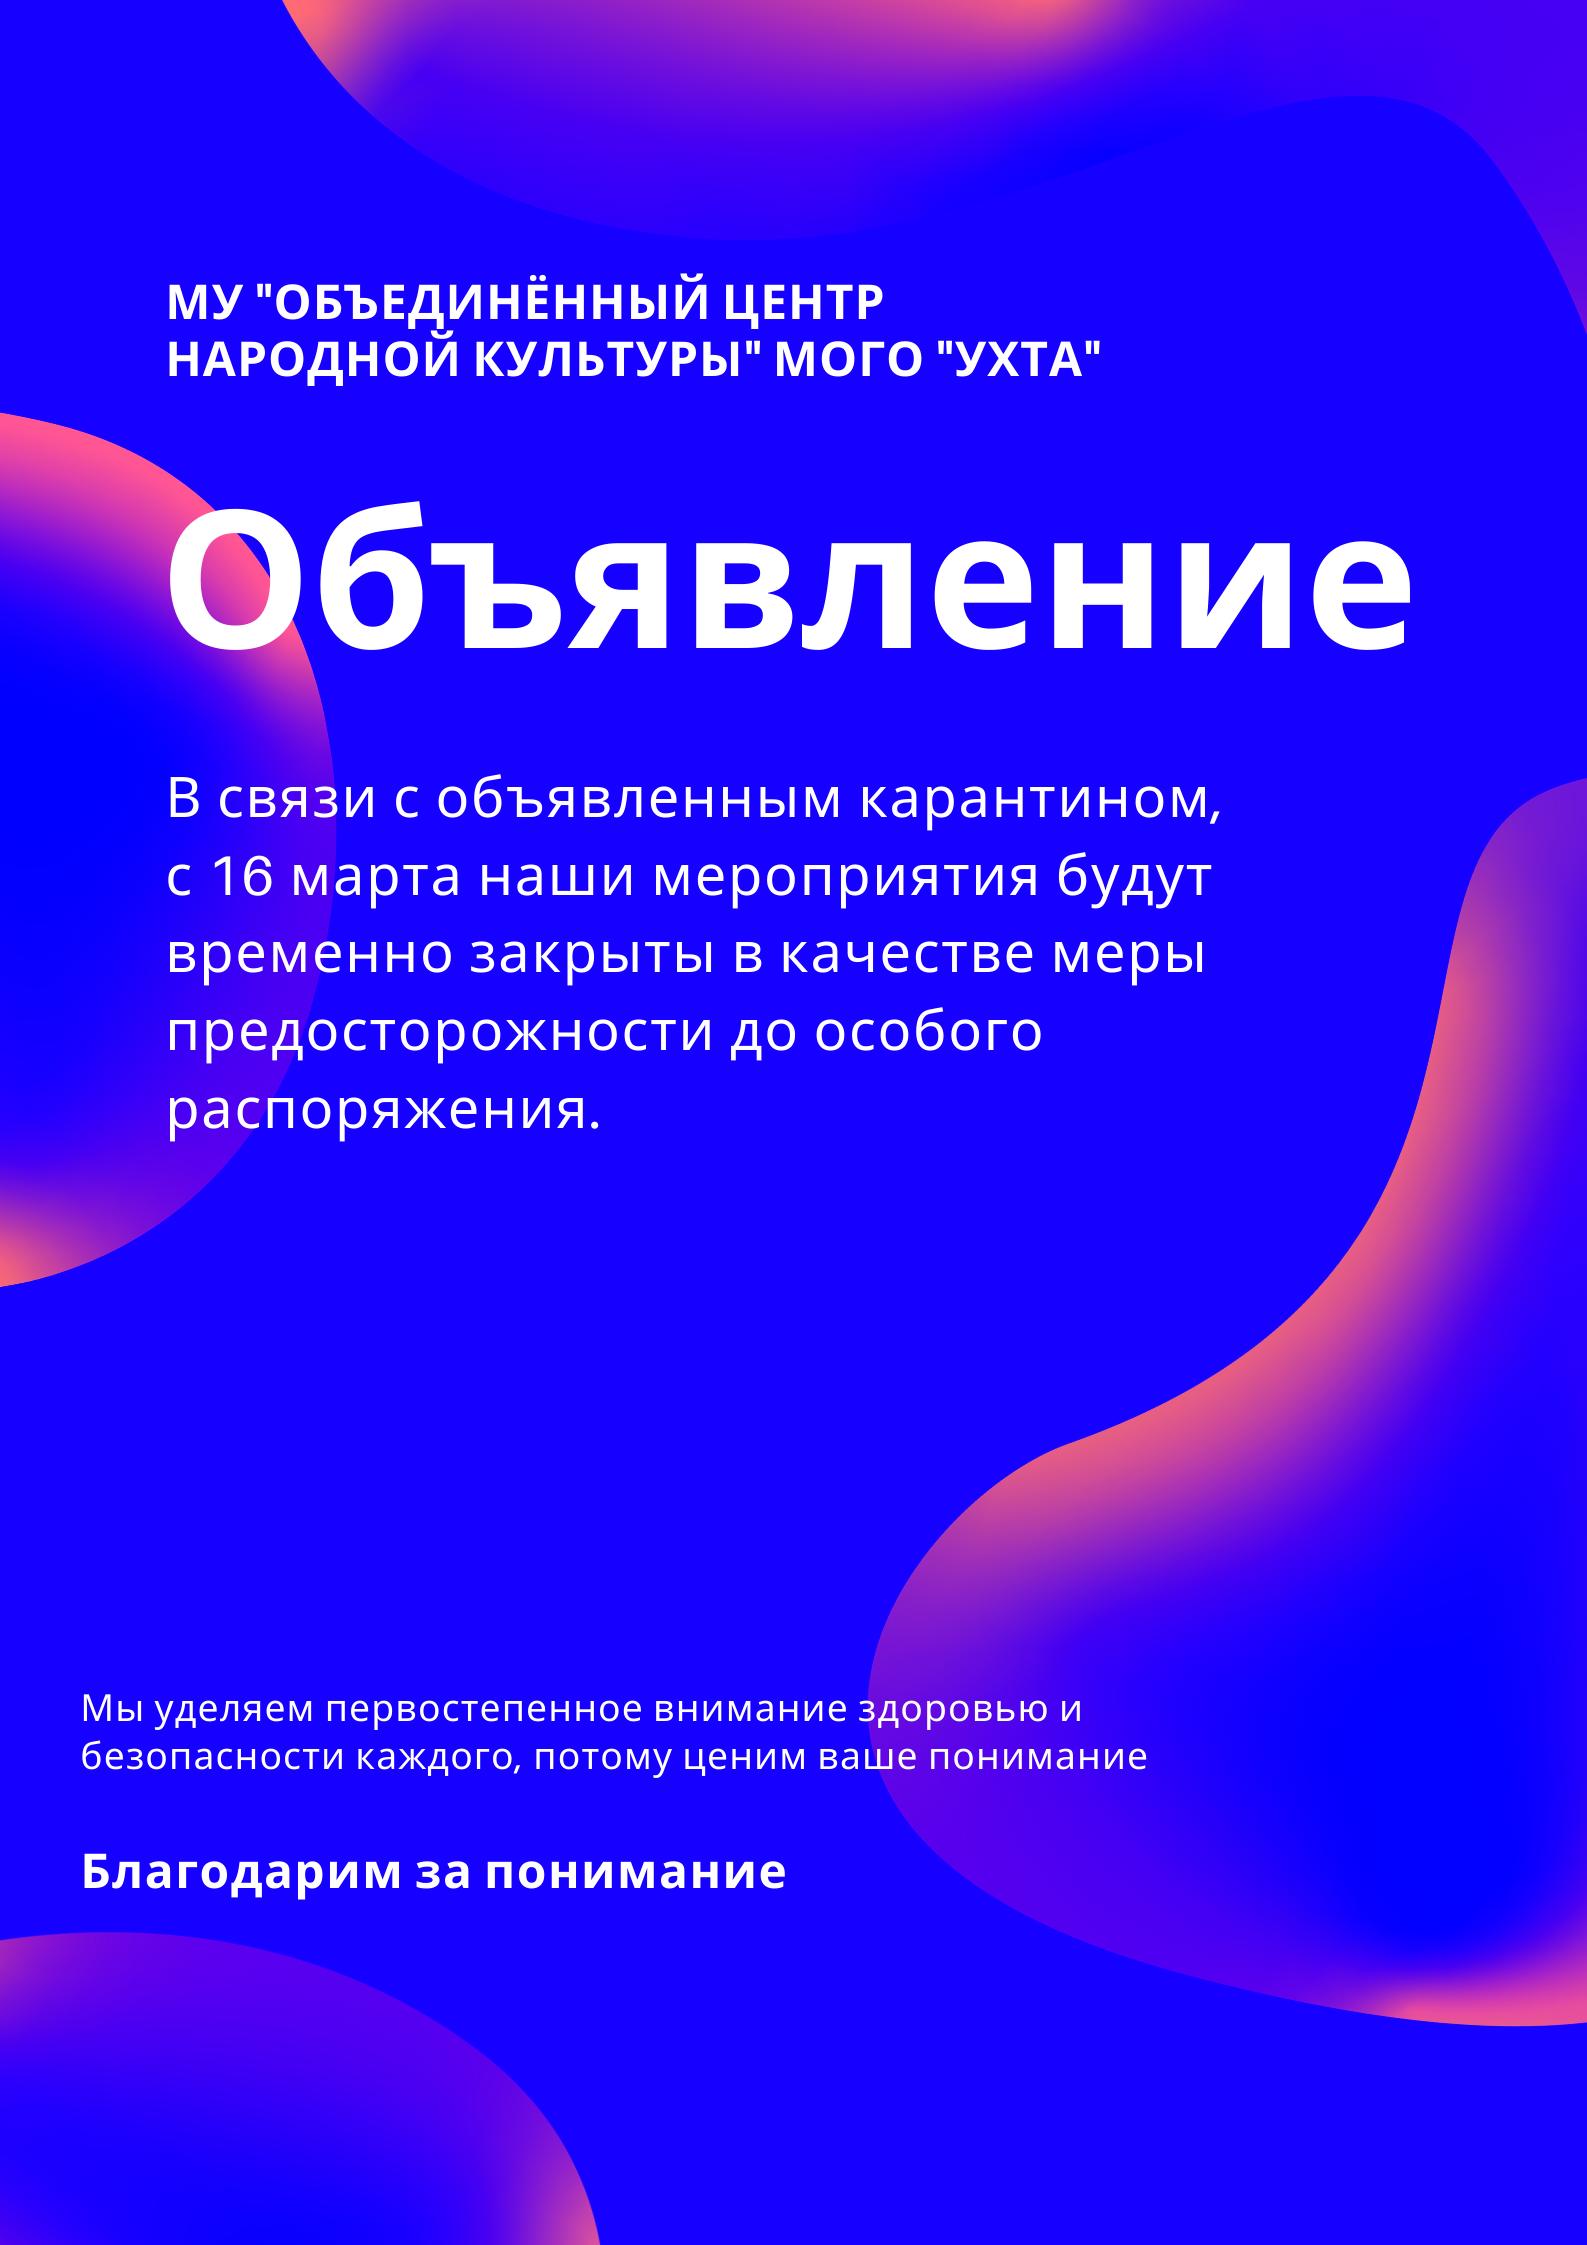 МУ _Объединённый центр народной культуры_ МОГО _Ухта_